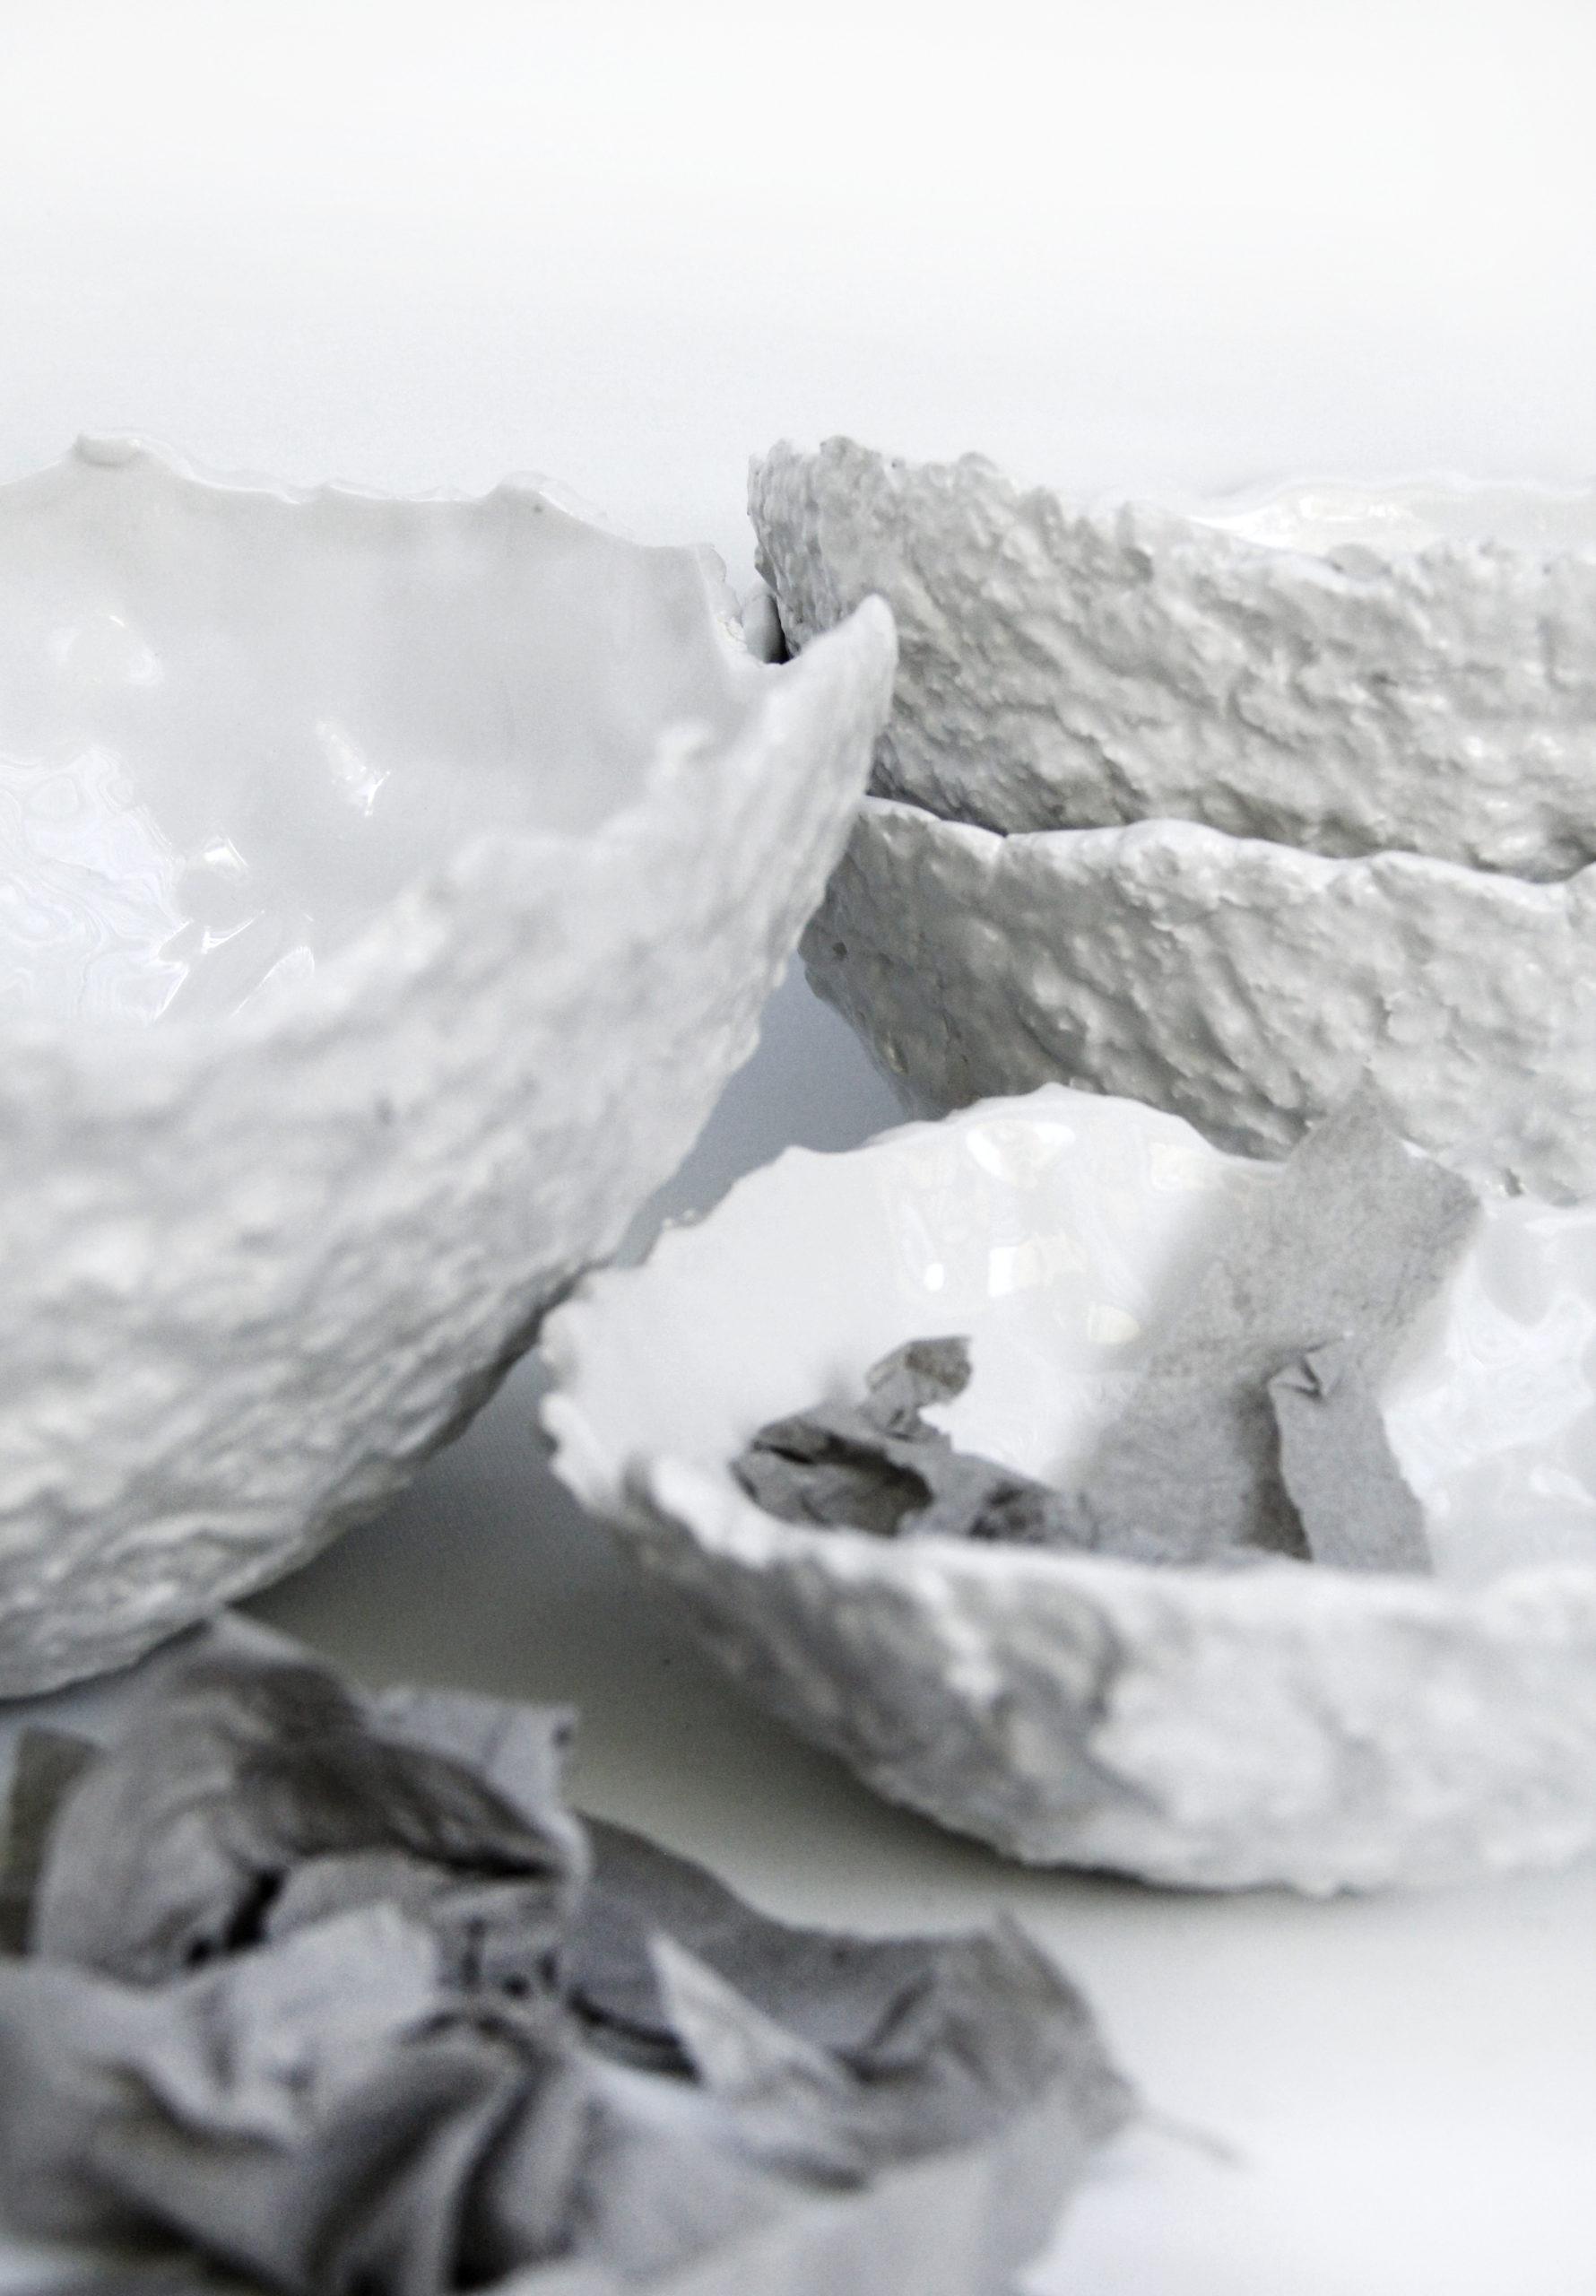 cuencos de diseño blancos ceramica fabricados a mano papel mashe irregulares